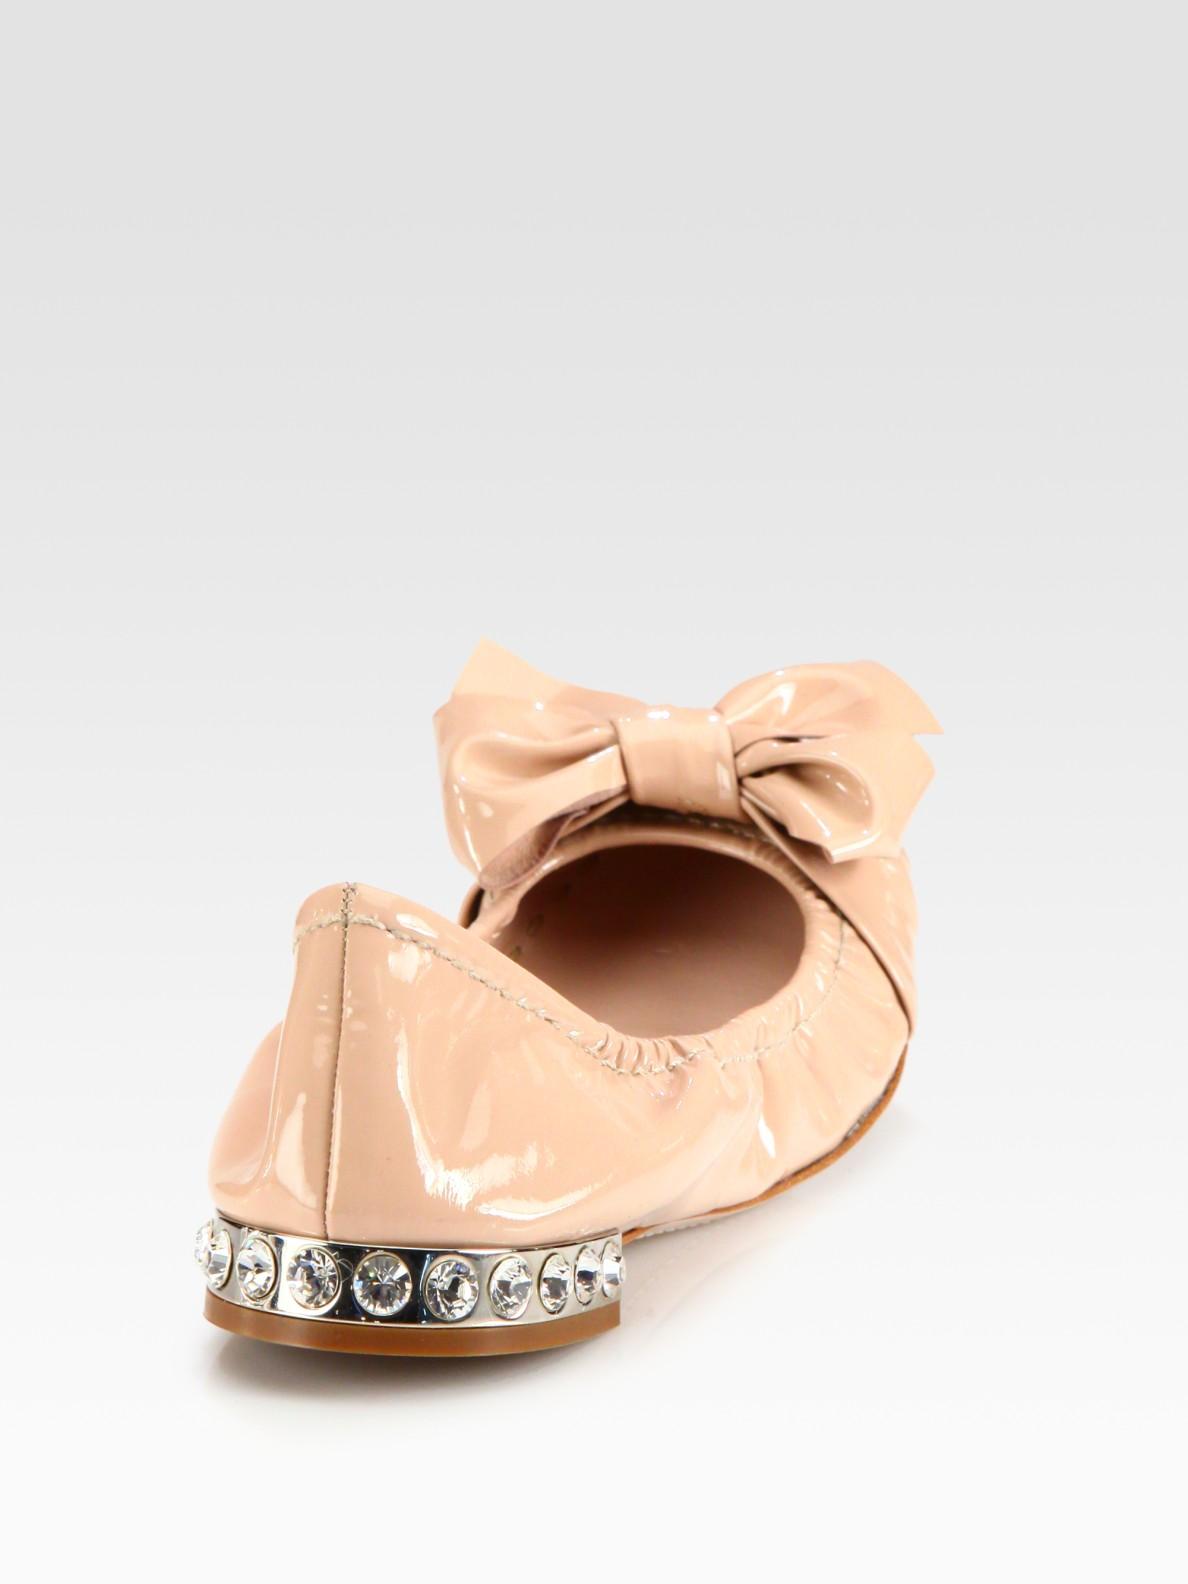 7befe3c665e Lyst - Miu Miu Glitter Patent Leather Bow Ballet Flats in Natural